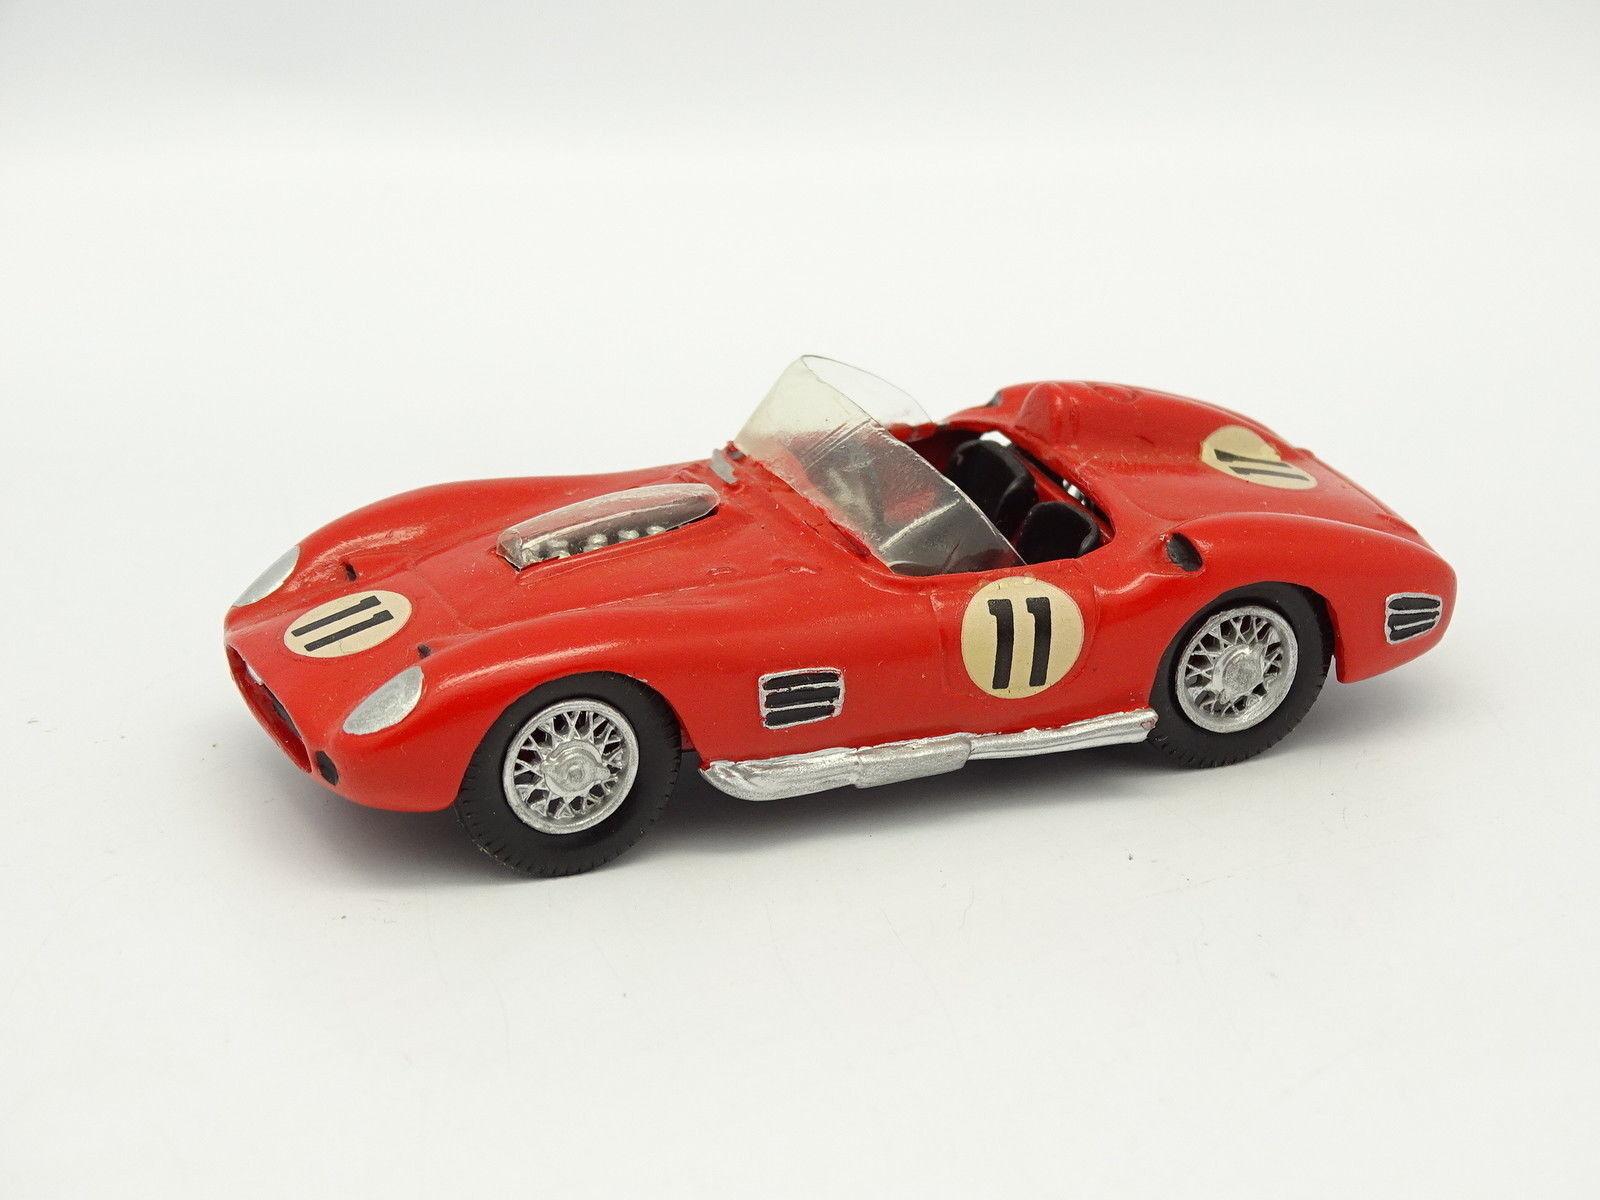 John Day Set aufgebaut Metall 1 43 - Ferrari 250 TR TestaRossa Le Mans 1960